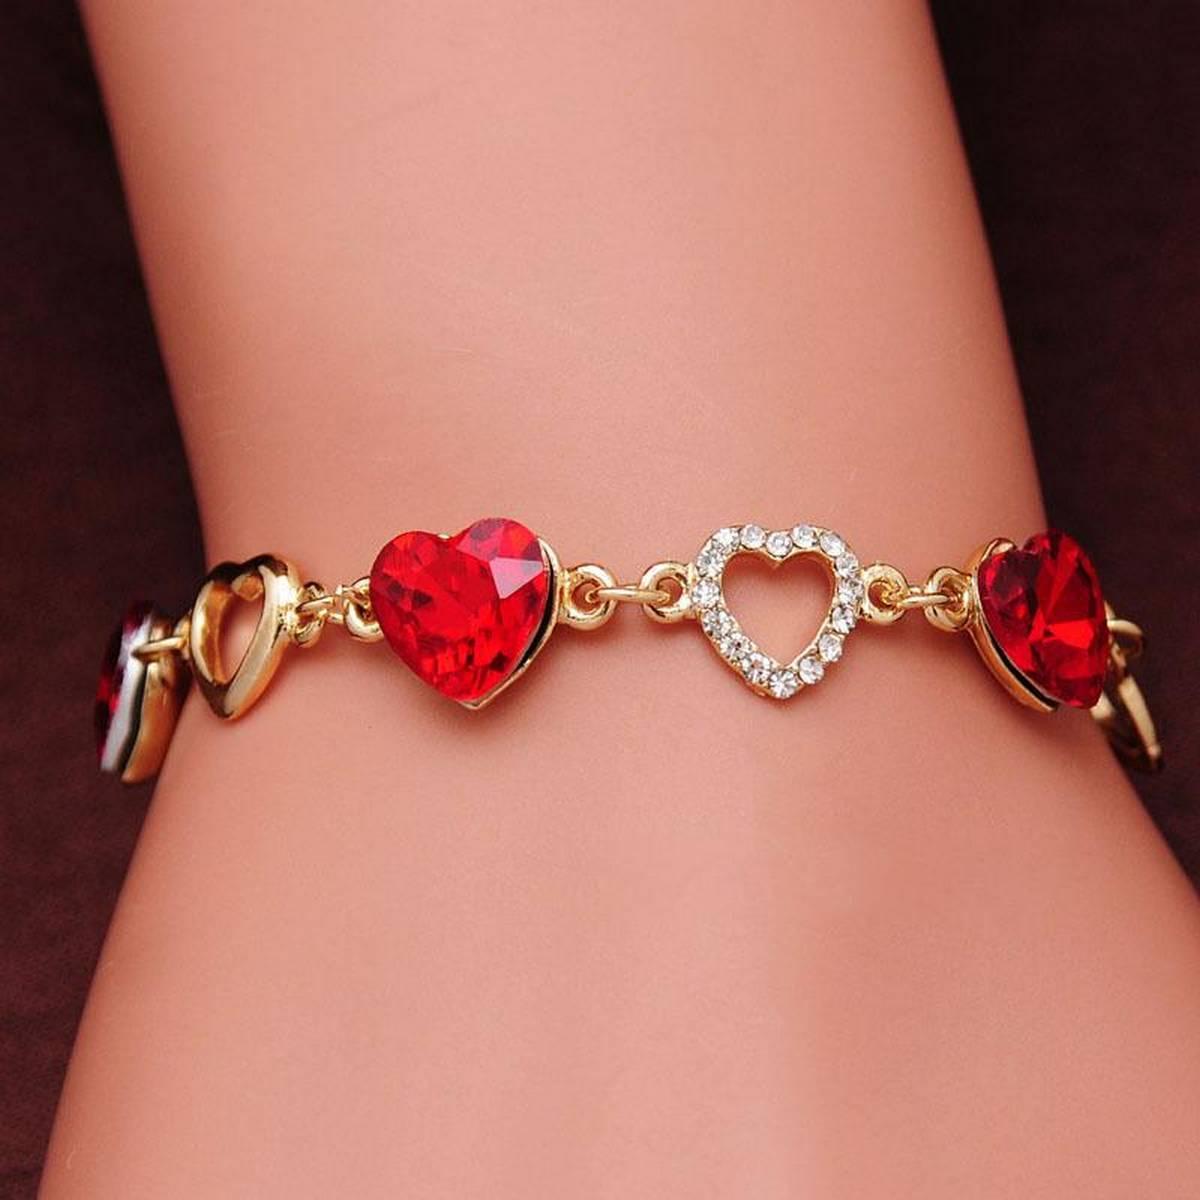 girls Bracelets Heart shape bracelets for girls women ladies and teenage girls